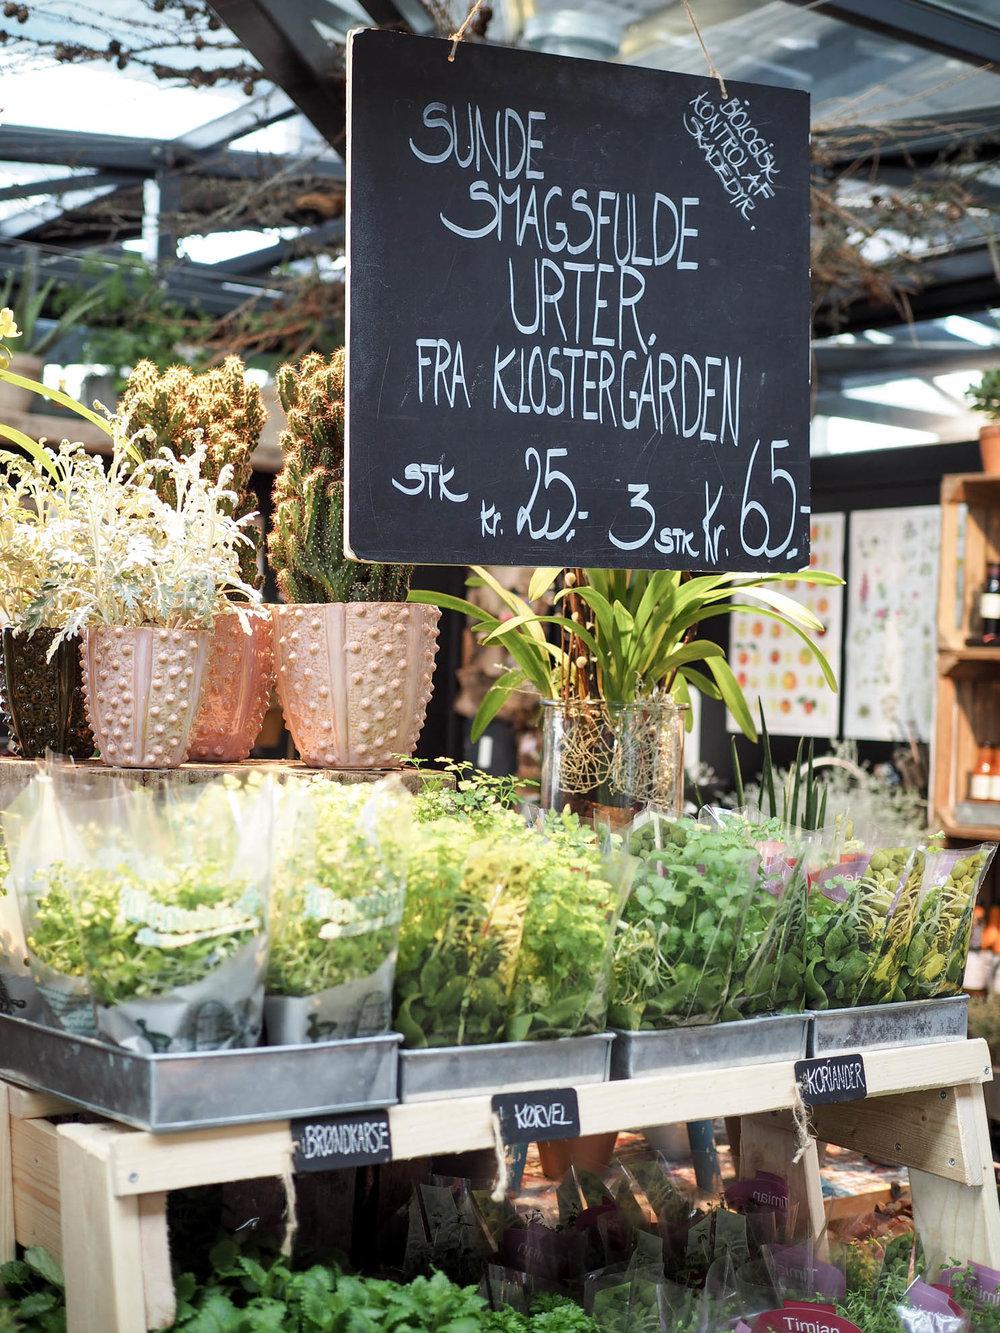 Shopping at Torvehallerne food market in Copenhagen